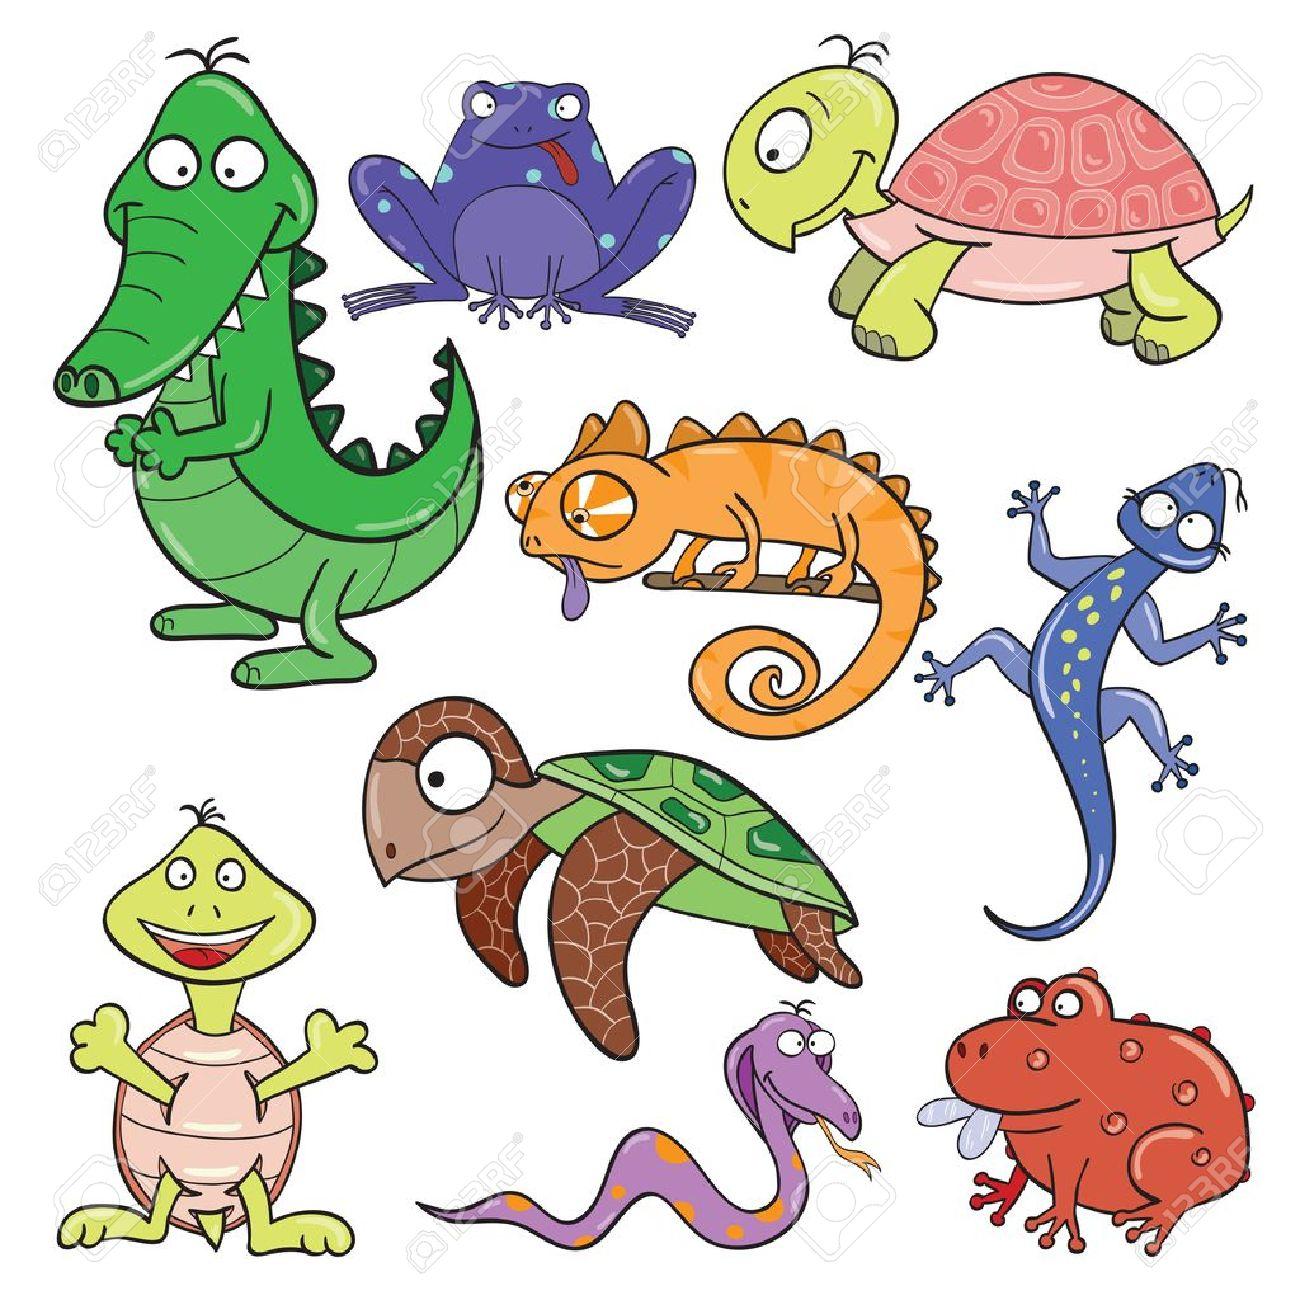 Amphibian clipart #11, Download drawings